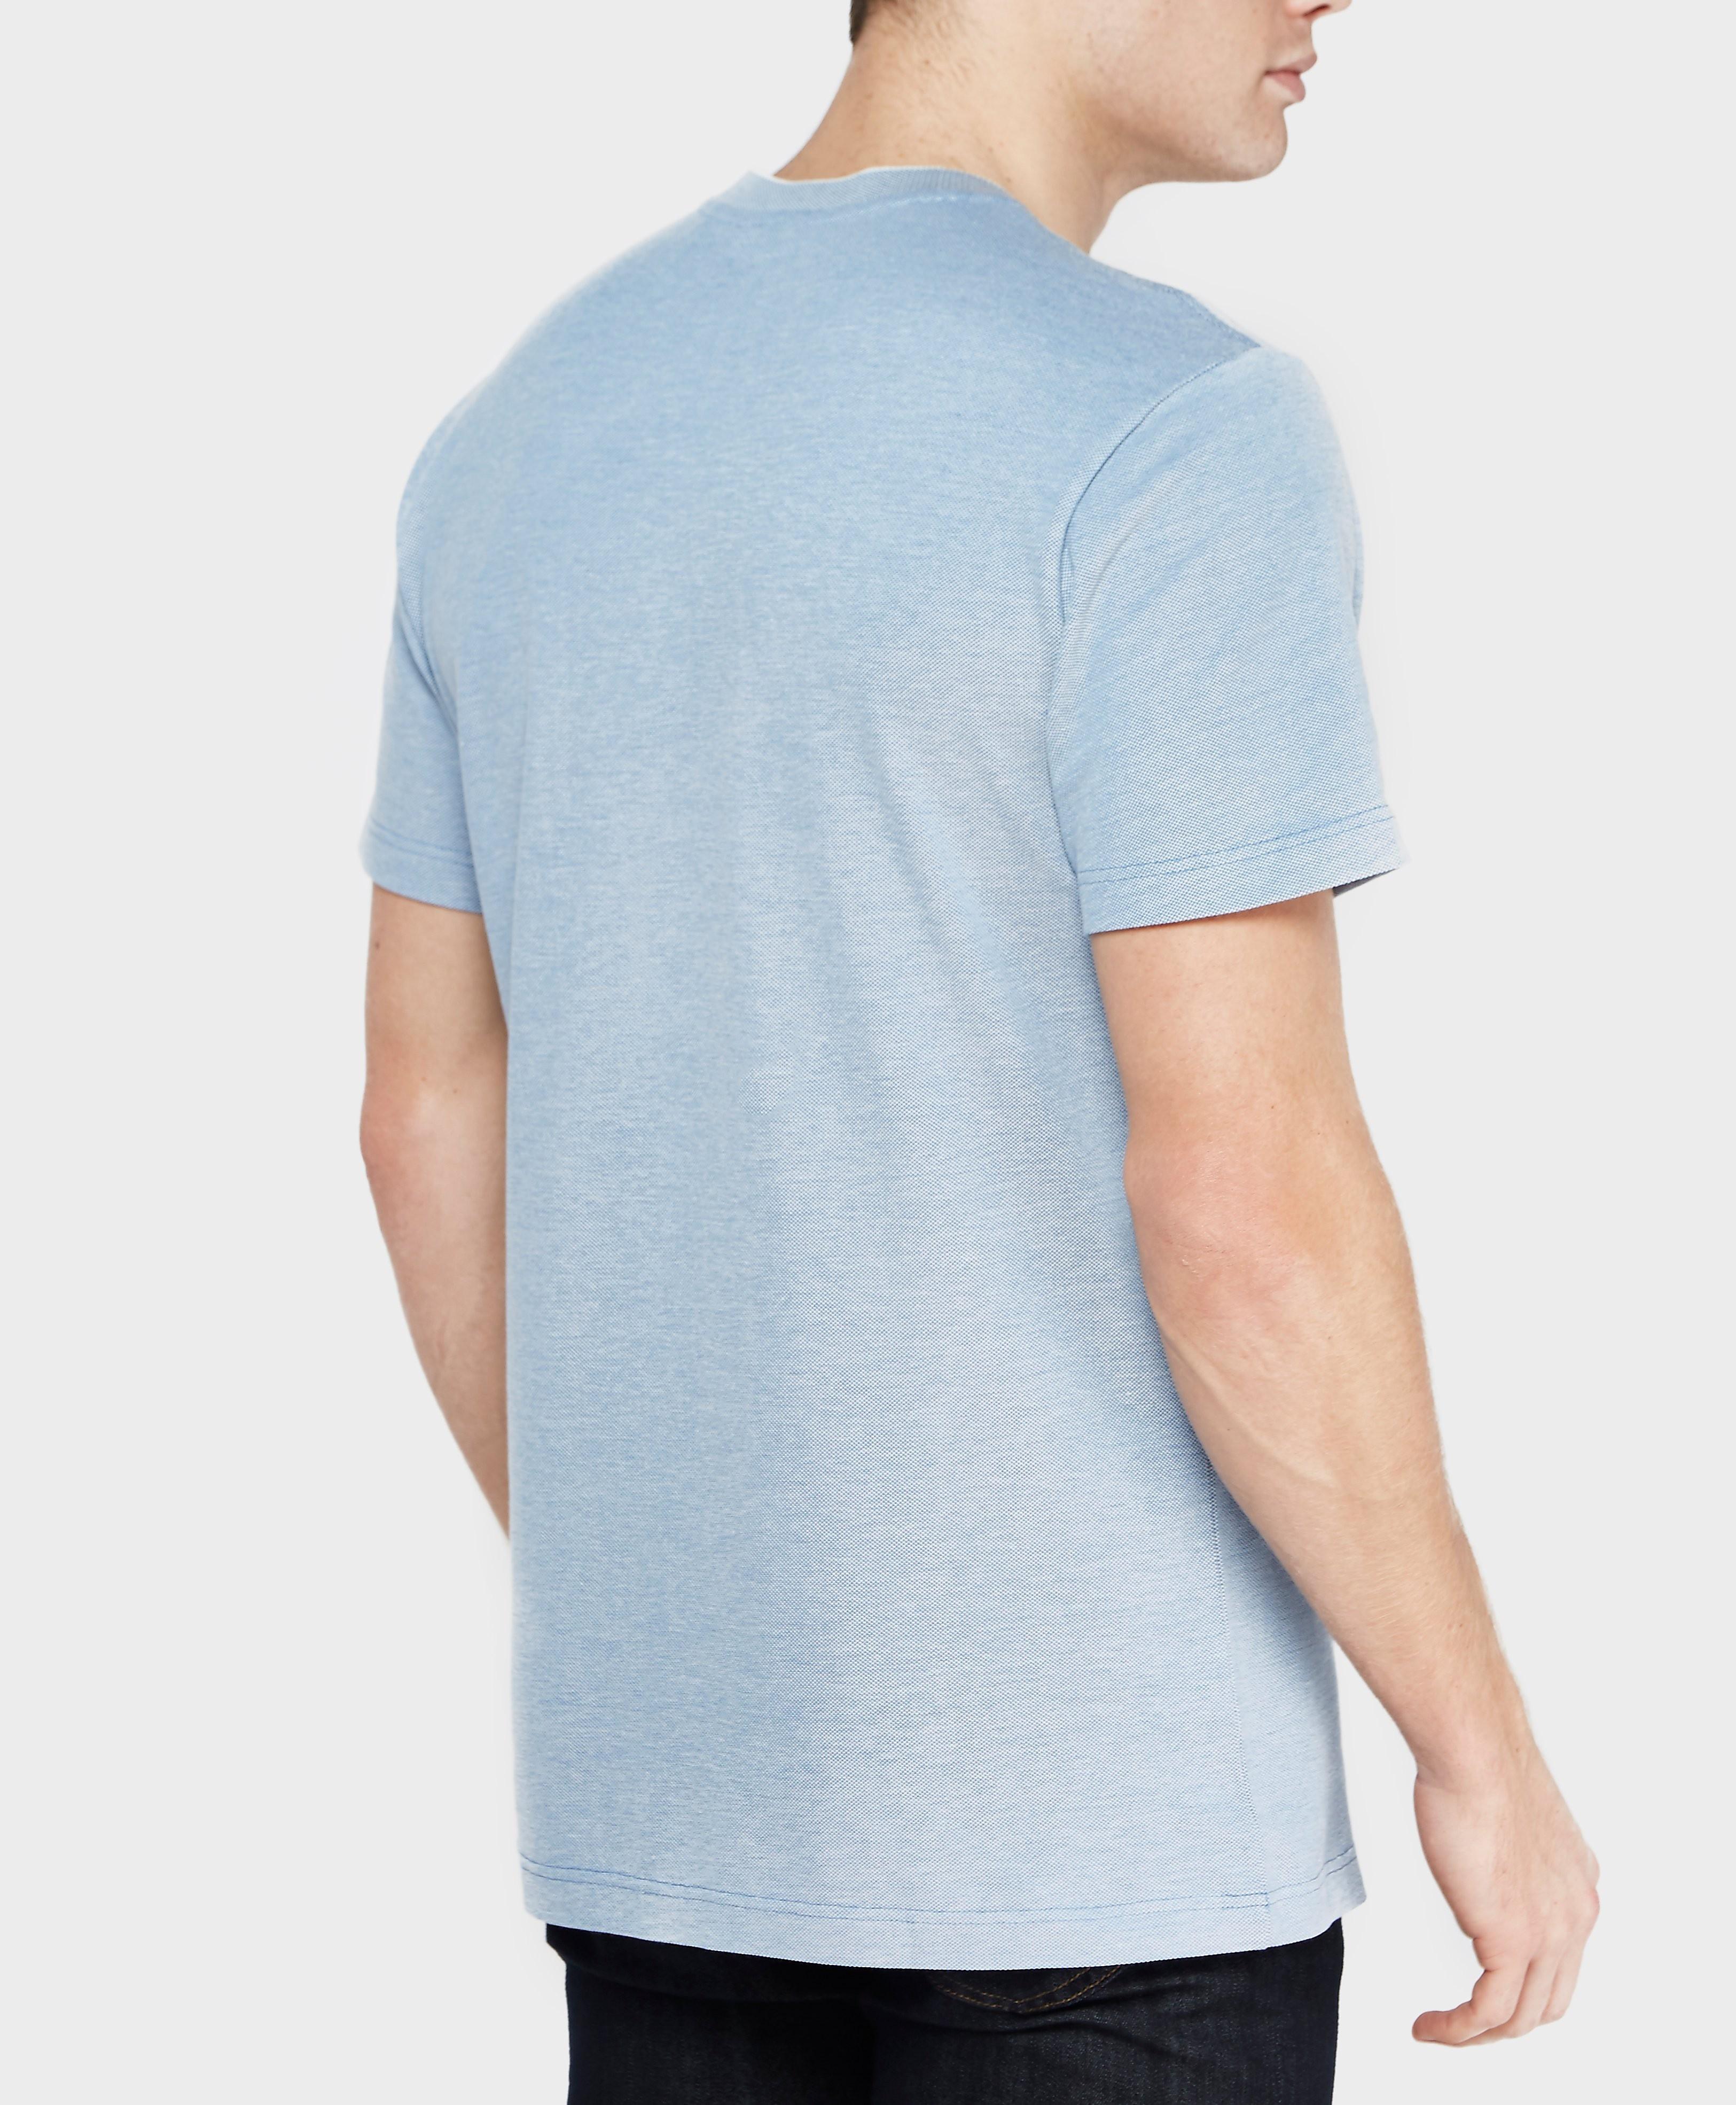 Lacoste Beye Pique Short Sleeve T-Shirt